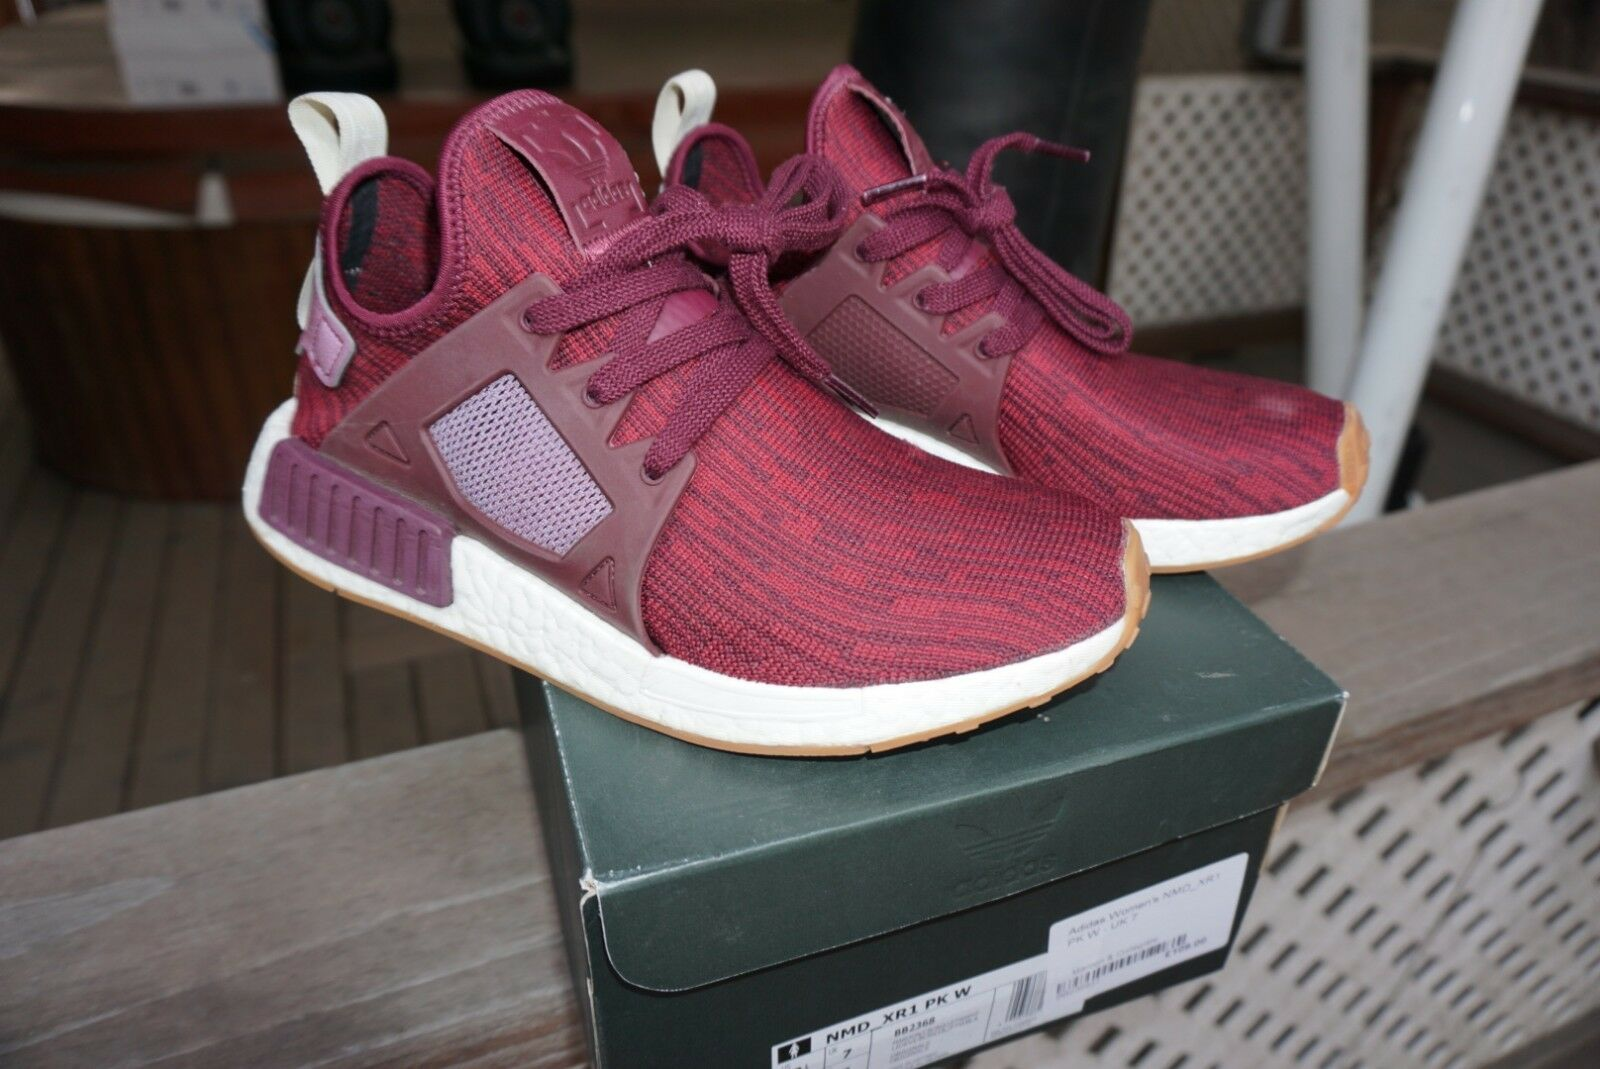 Adidas NMD Xr1 Maroon Burgundy Gum Women Size 8.5 Men Size 7.5 Primeknit